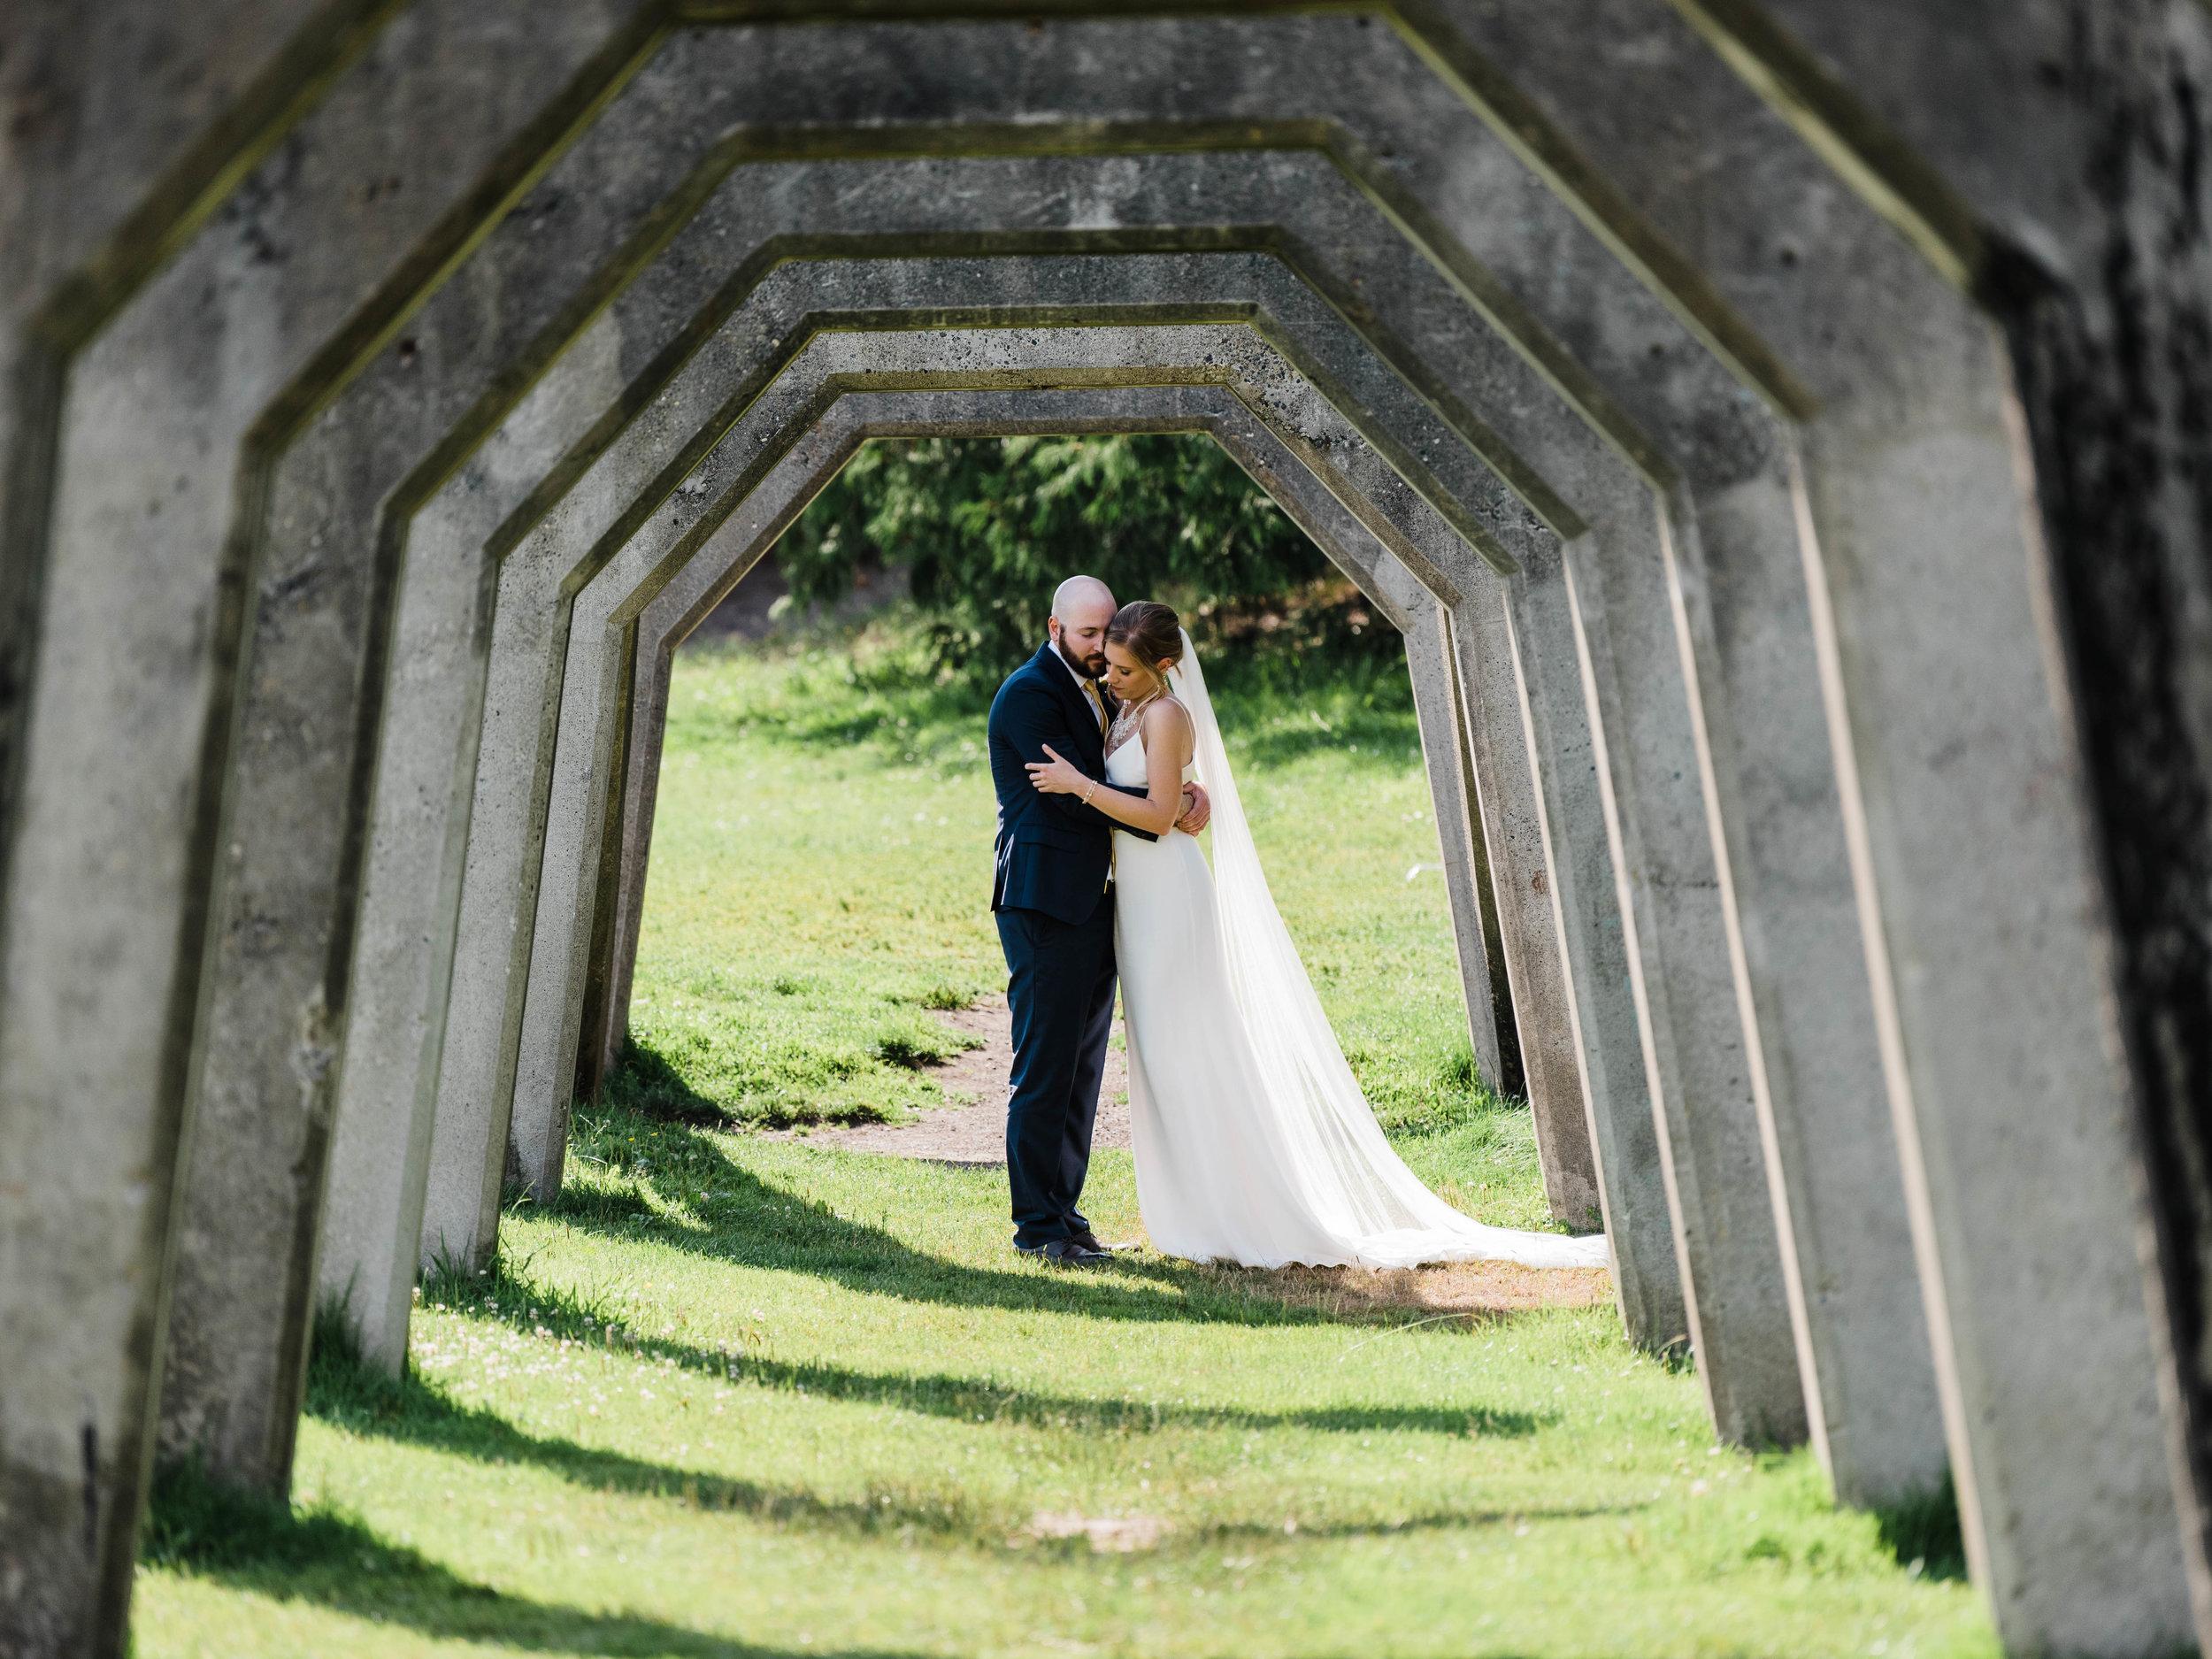 Seattle Wedding- MV Skansonia - Anna + Josh -  (993) - Copy.jpg